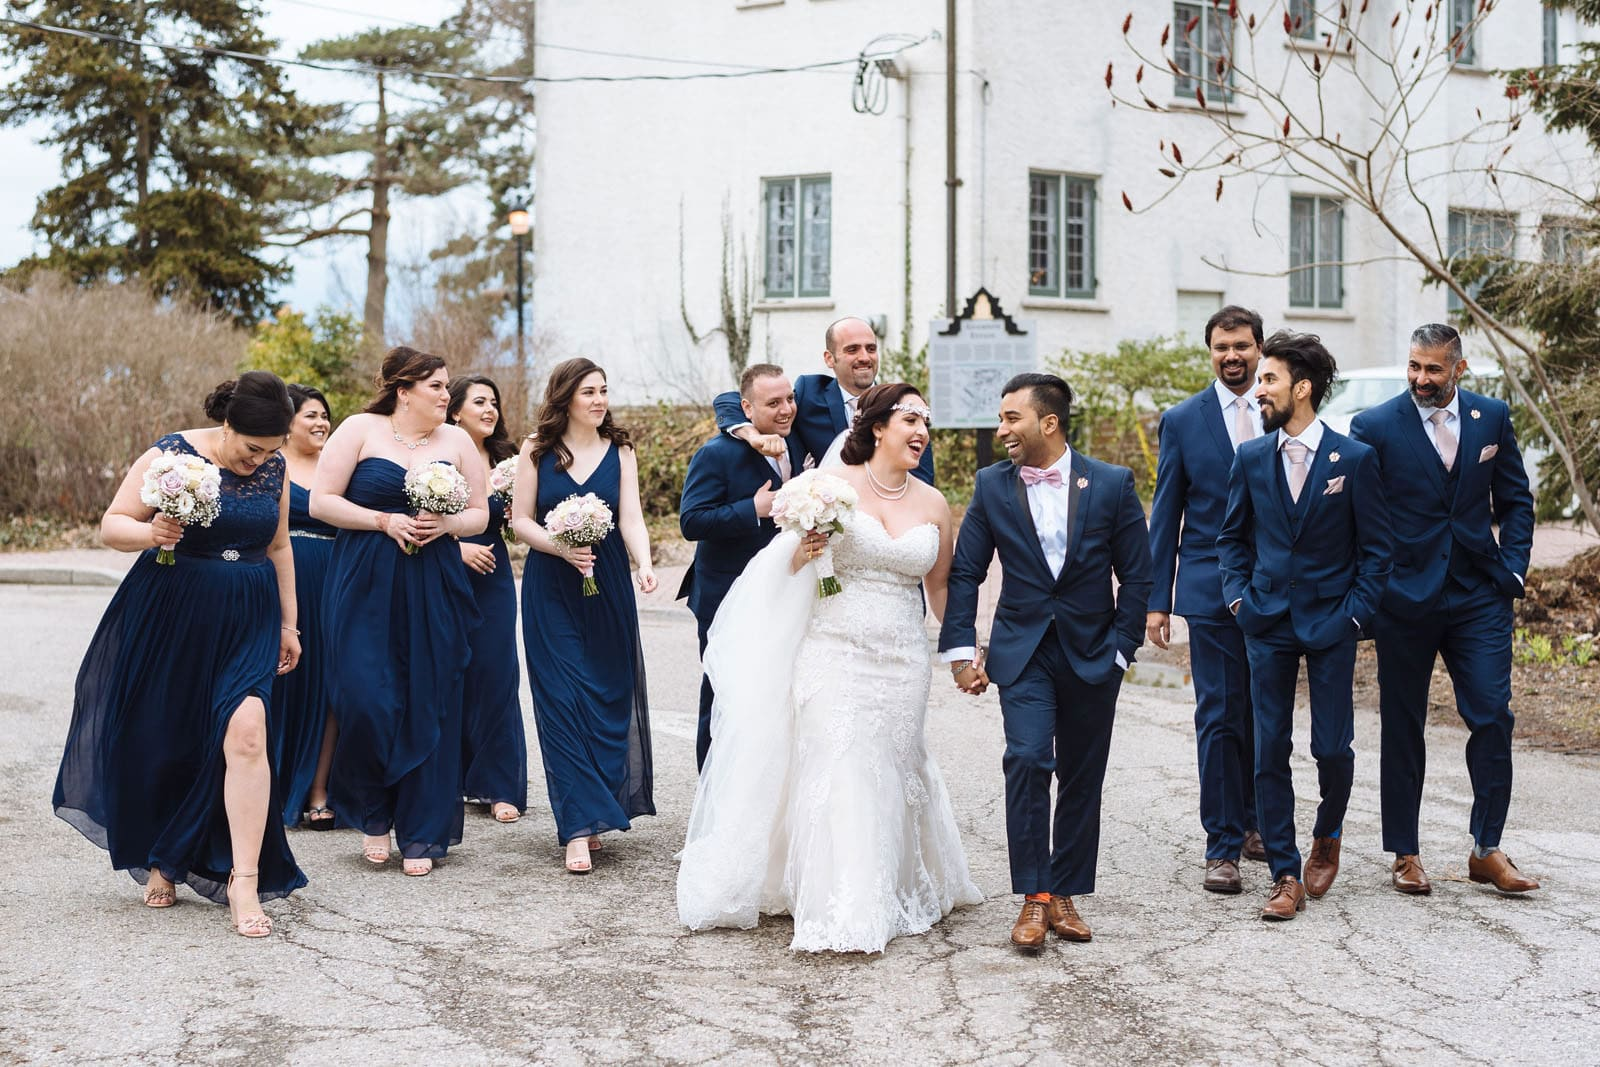 Our Lady of Sorrows Church Wedding | Toronto Wedding Studios | Wedding Photographer | Creative Wedding Photography | Timeless Wedding Photography